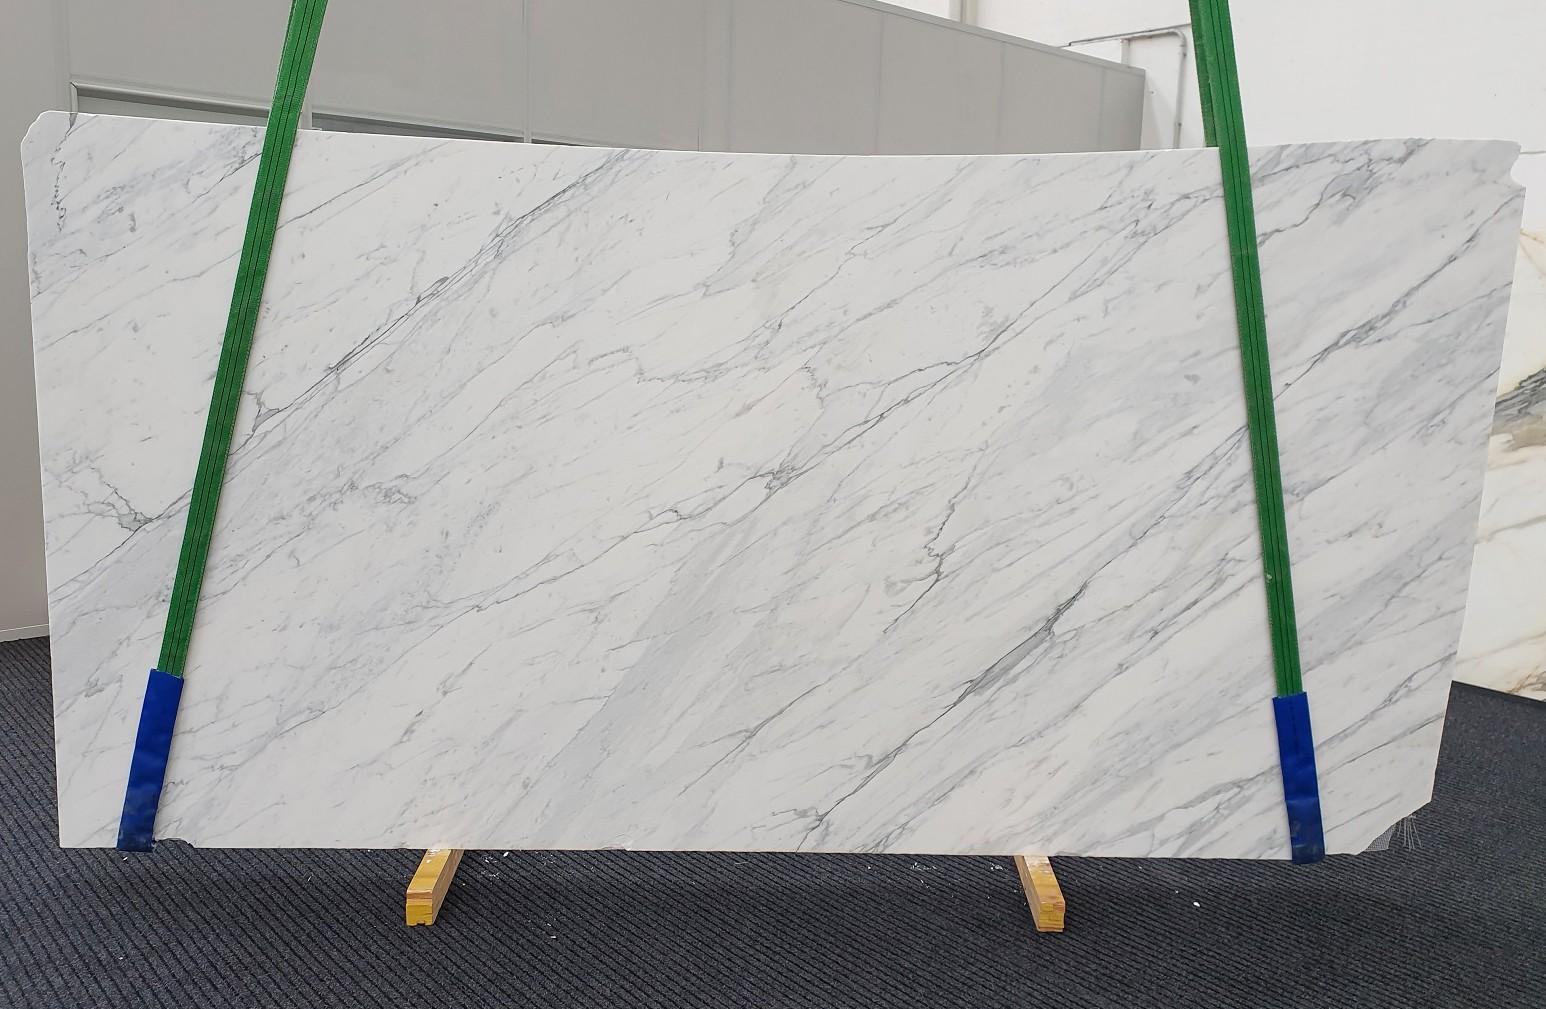 CALACATTA CARRARA Supply Veneto (Italy) honed slabs 1313 , Slab #43 natural marble